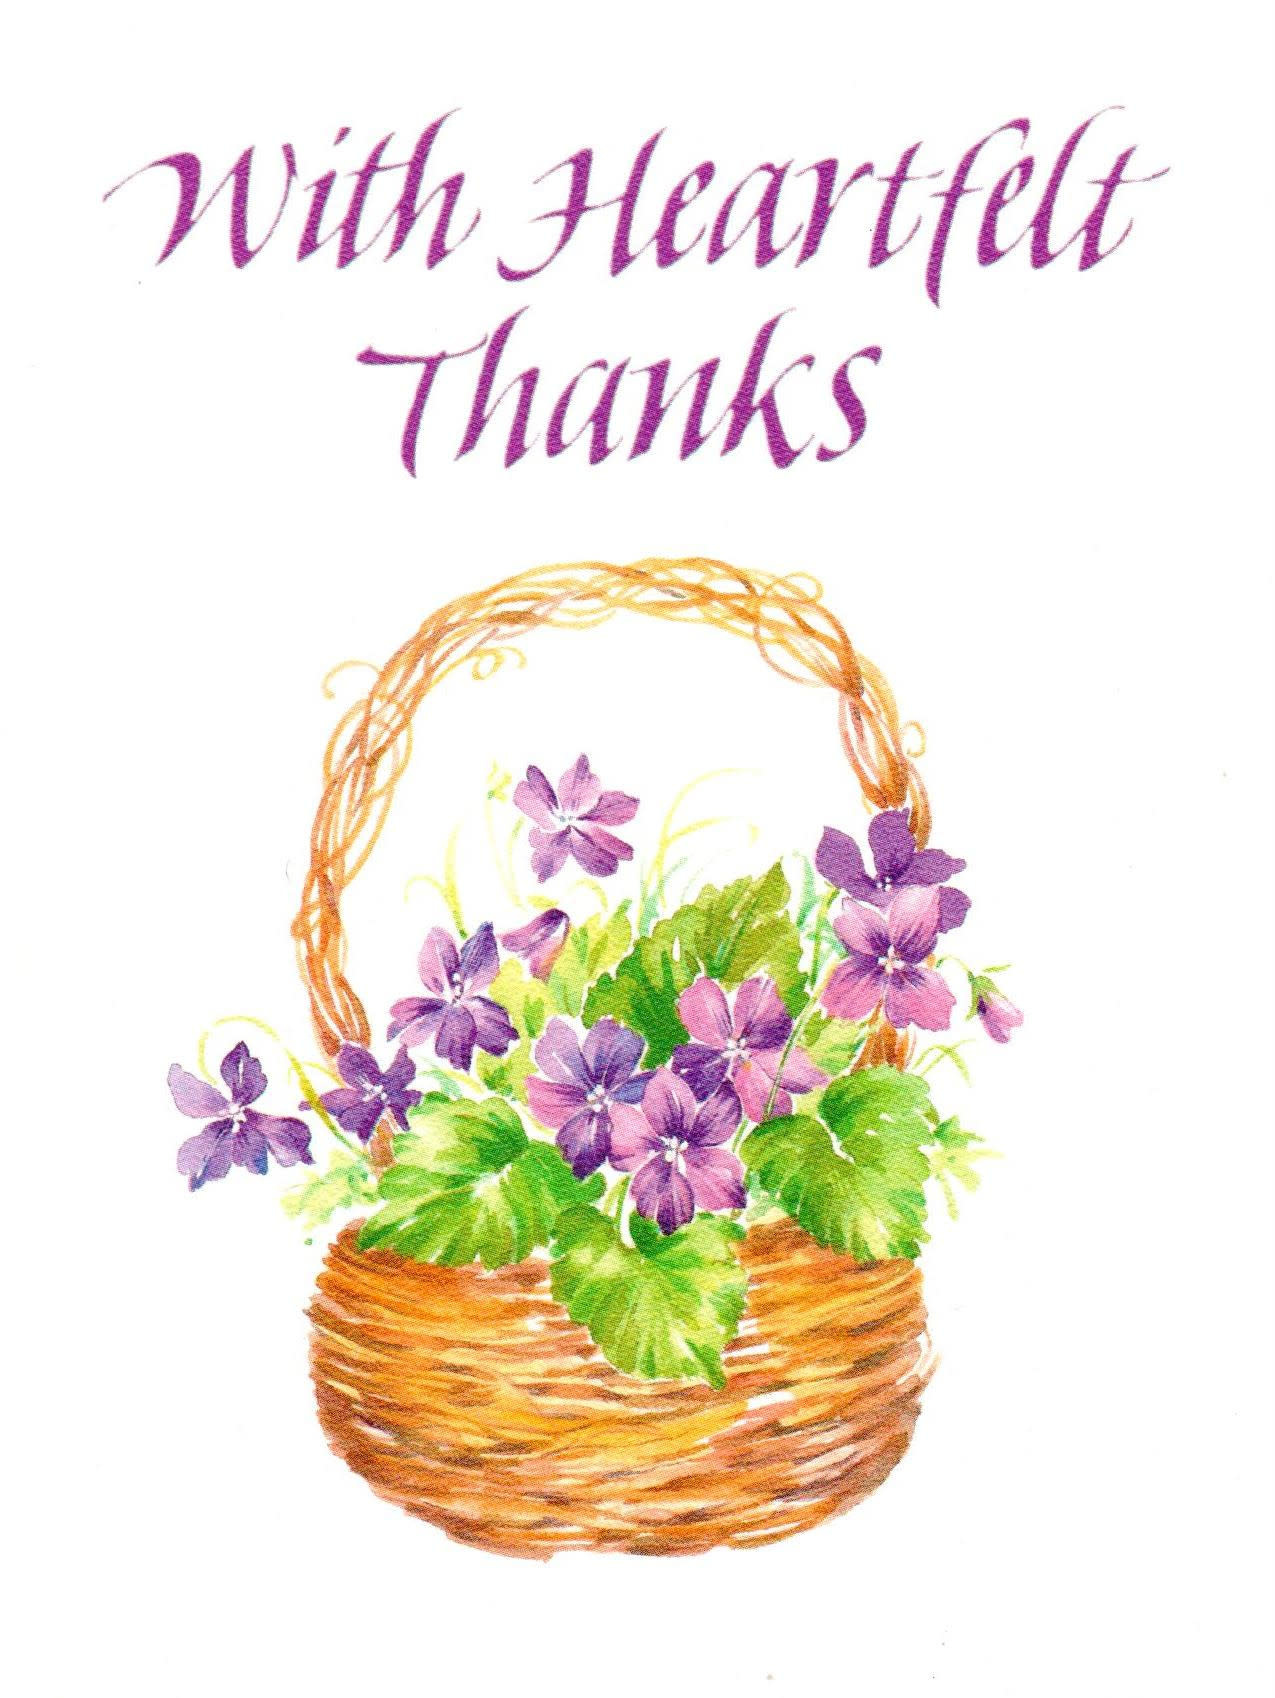 With Heartfelt Thanks